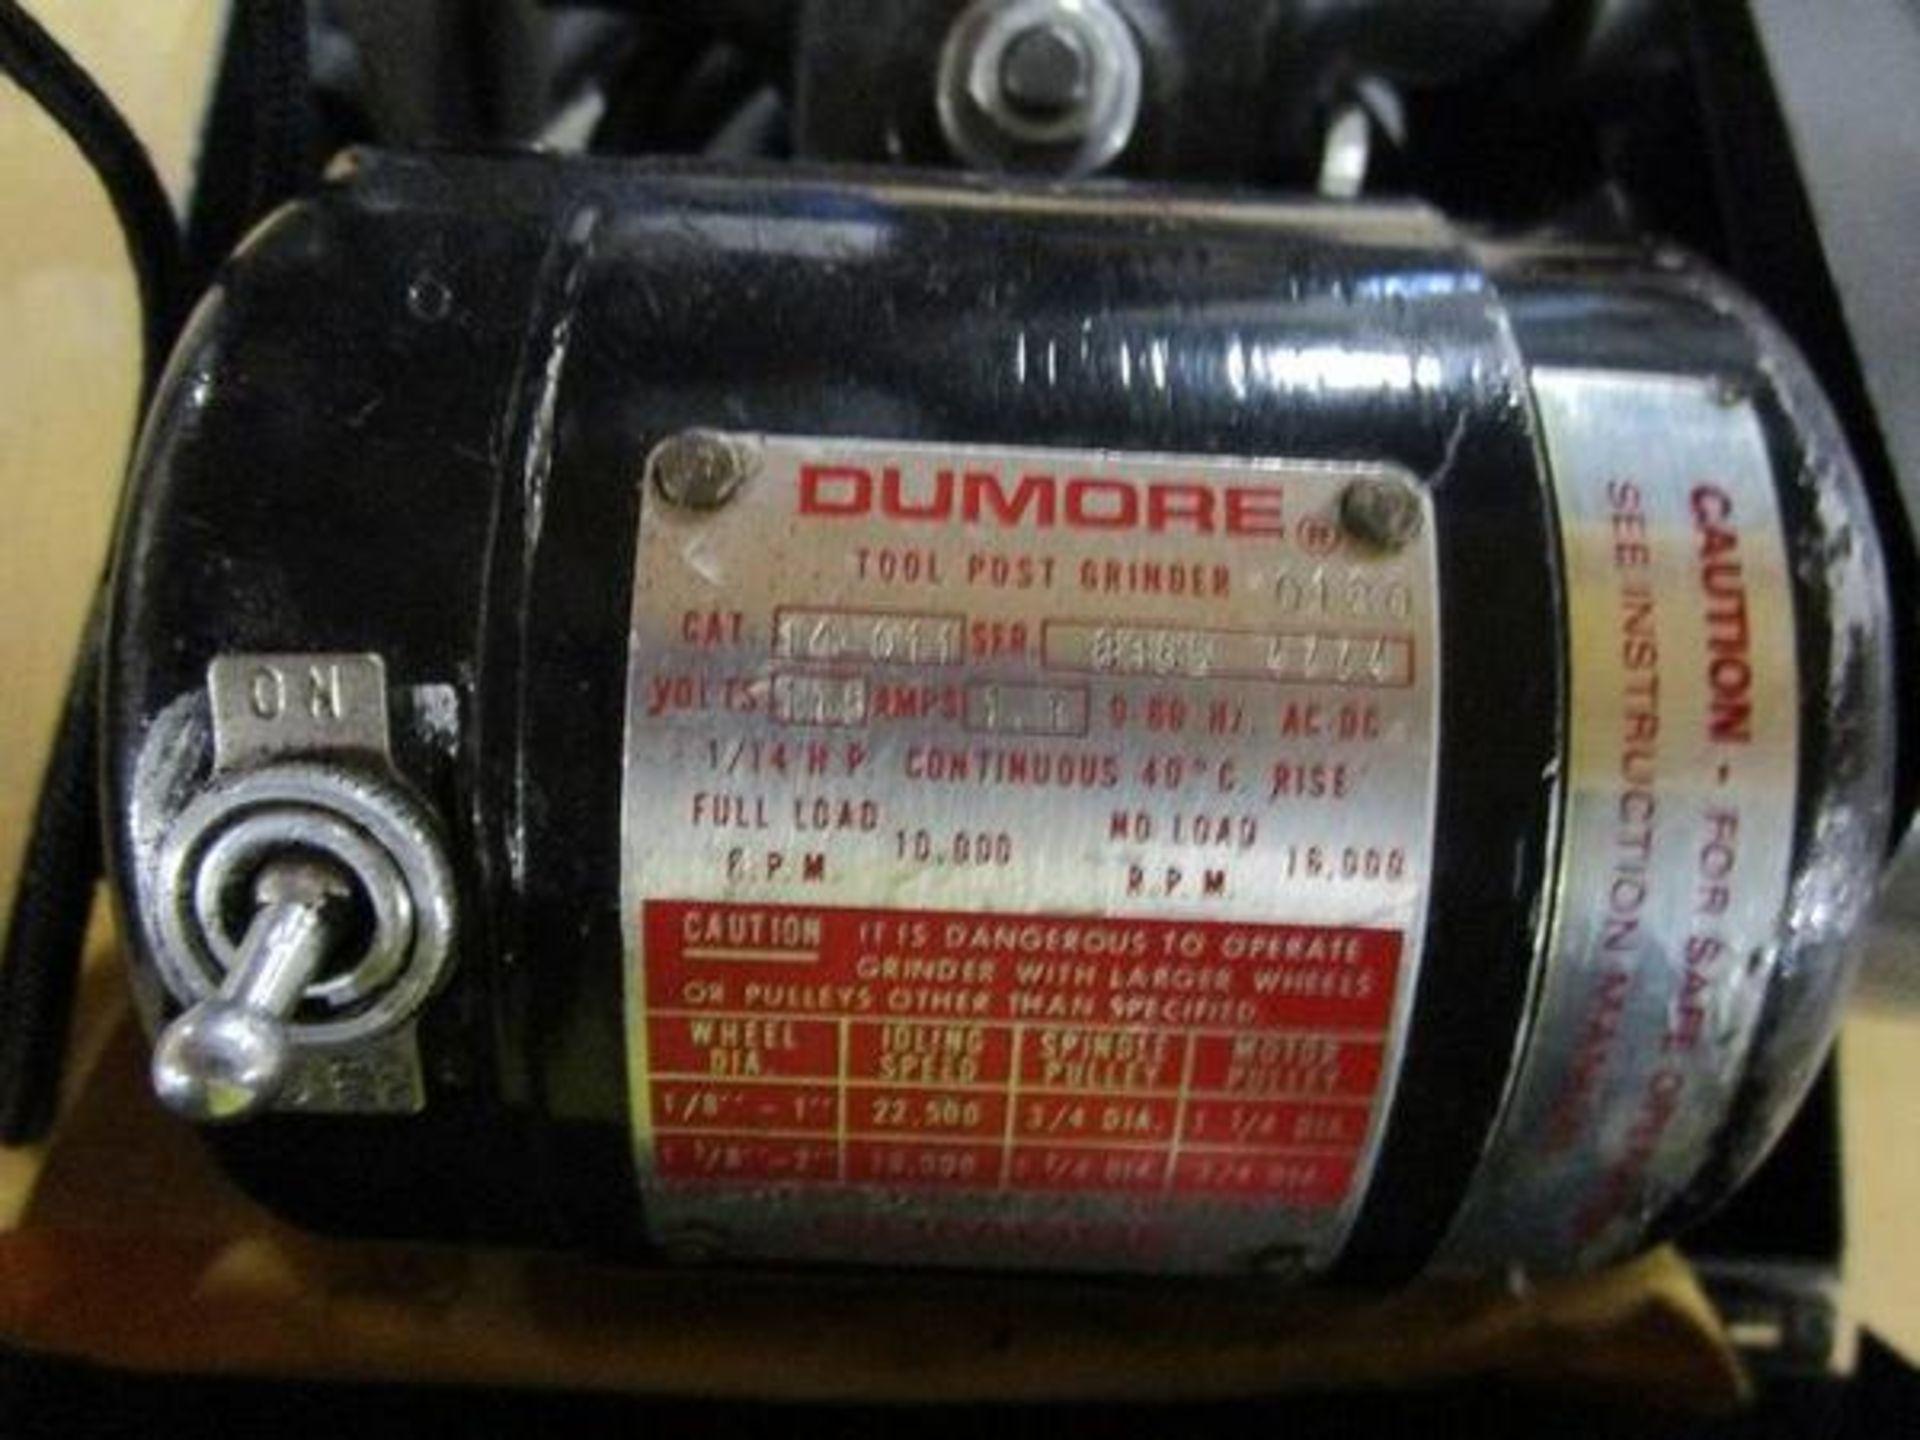 Dumore 0180 Tool Post Grinder Cat # 14-001 - Image 2 of 2